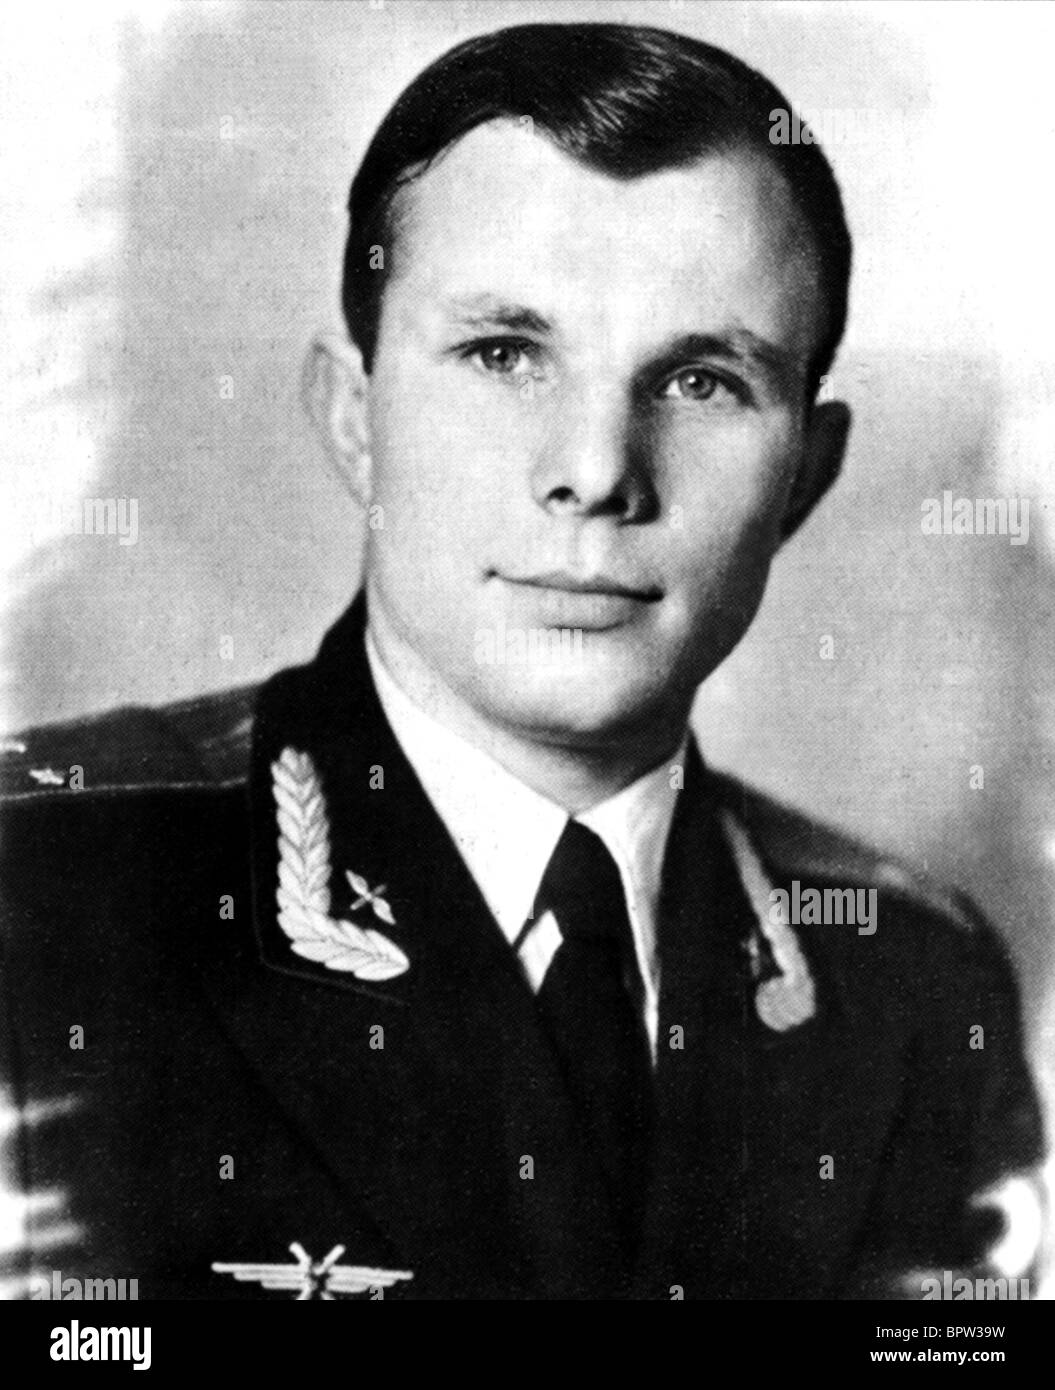 YURI GAGARIN RUSSIAN COSMONAUT 12 April 1957 - Stock Image